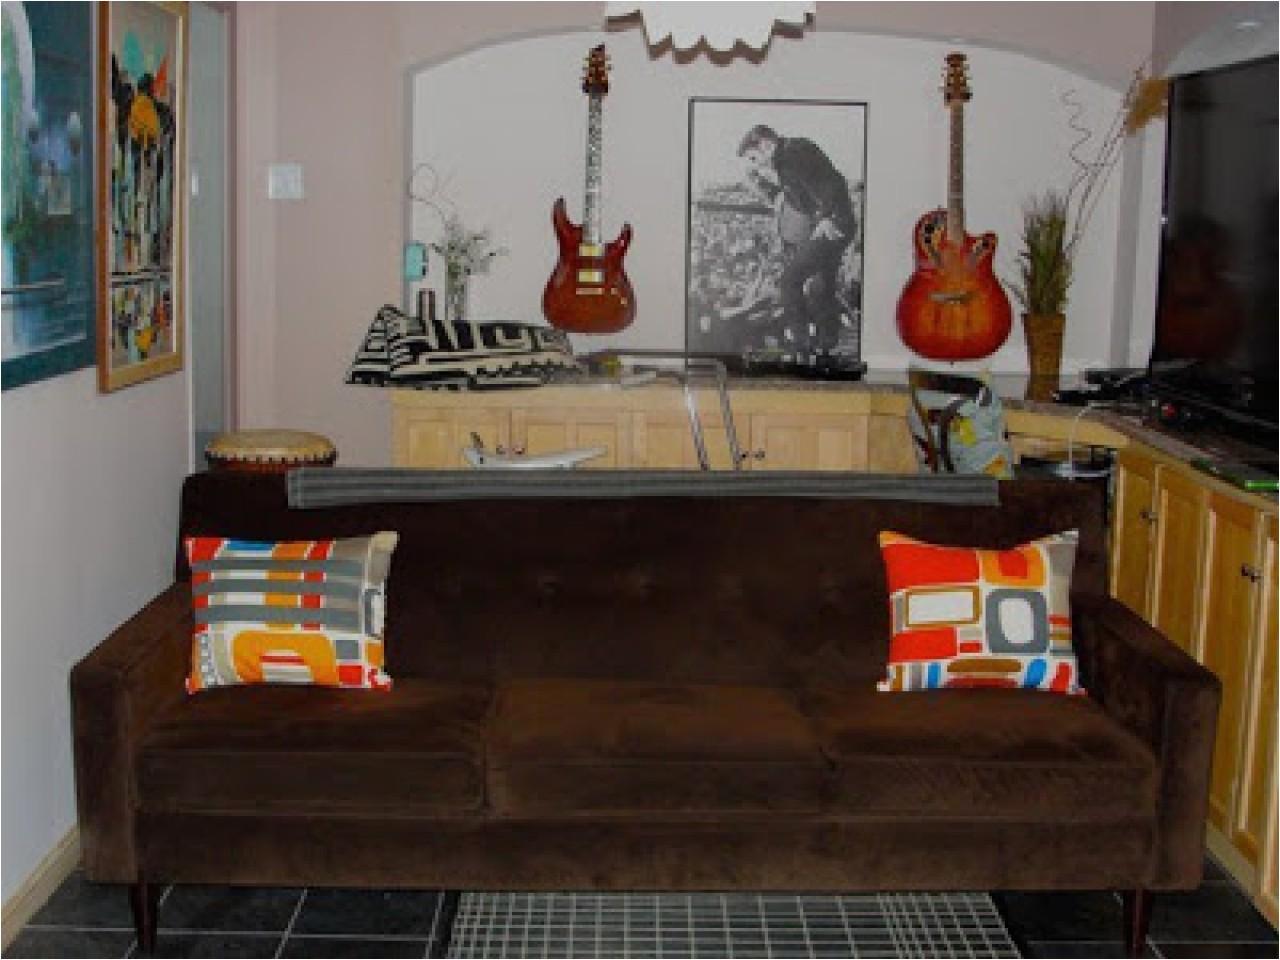 Craigslist north Shore Furniture Dining Room Set Craigslist Craigslist Boston north Shore